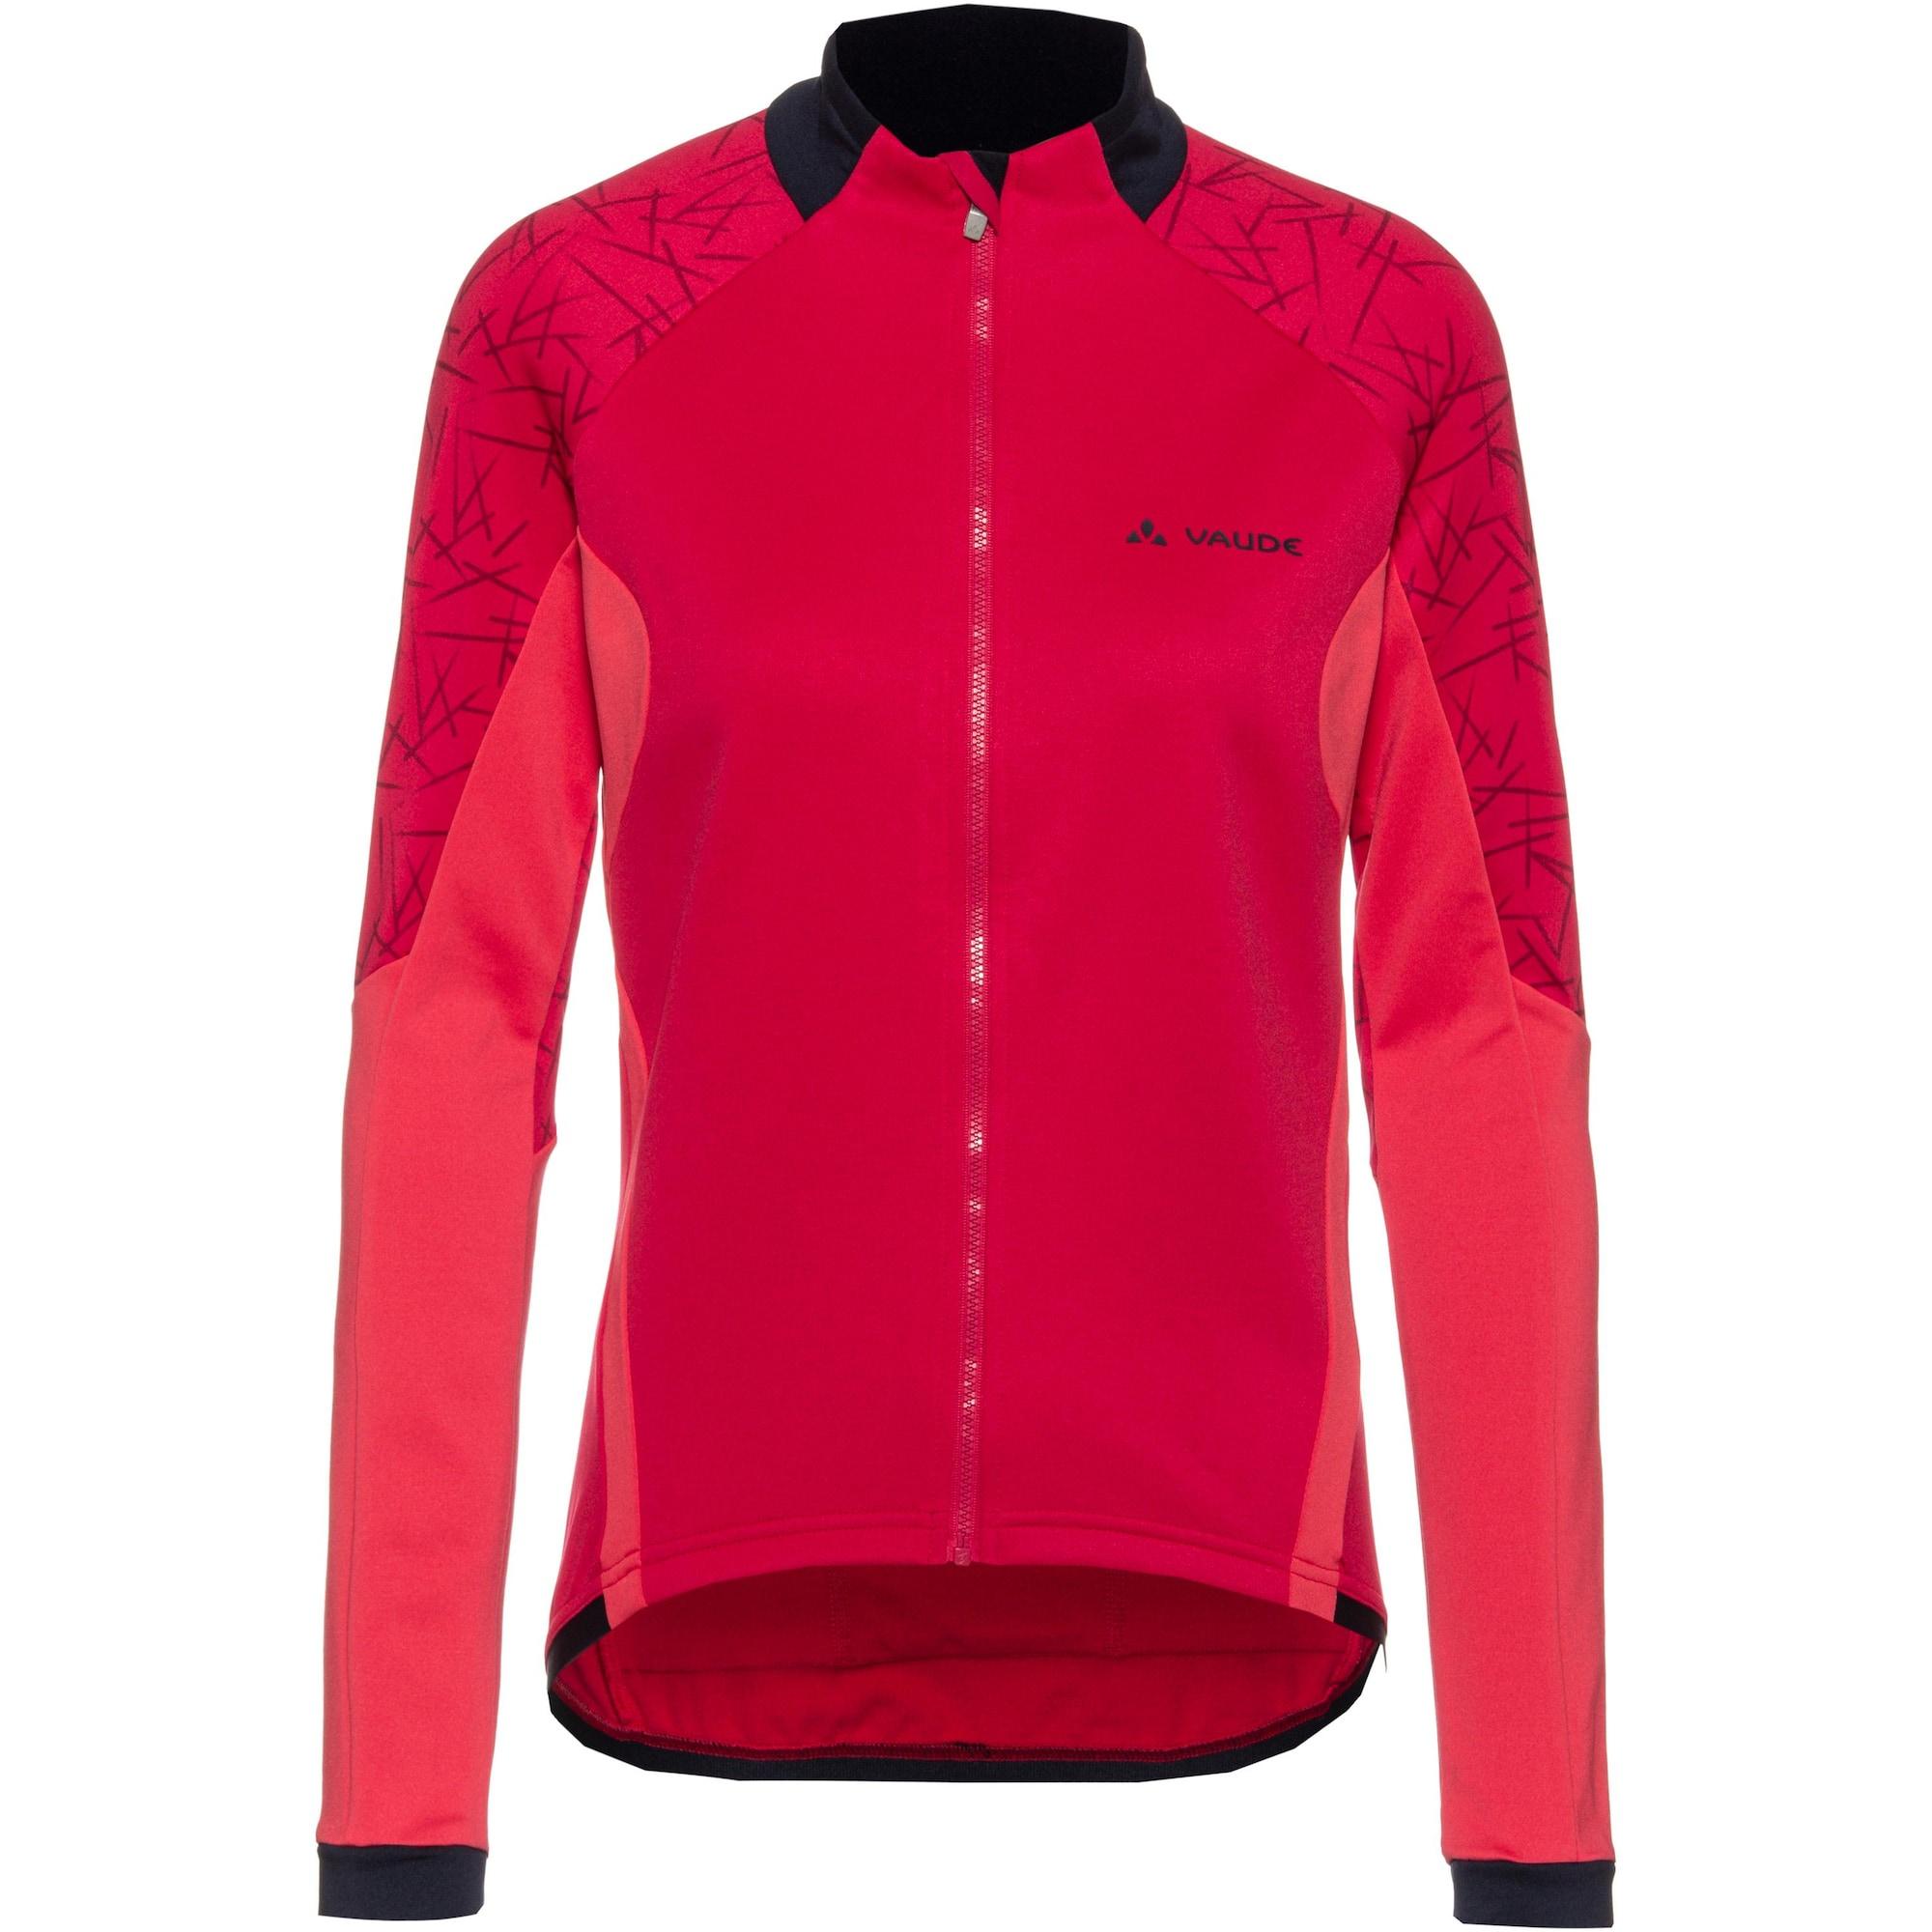 Fahrradtrikot 'Resca Tricot II' | Sportbekleidung > Trikots > Fahrradtrikots | Vaude